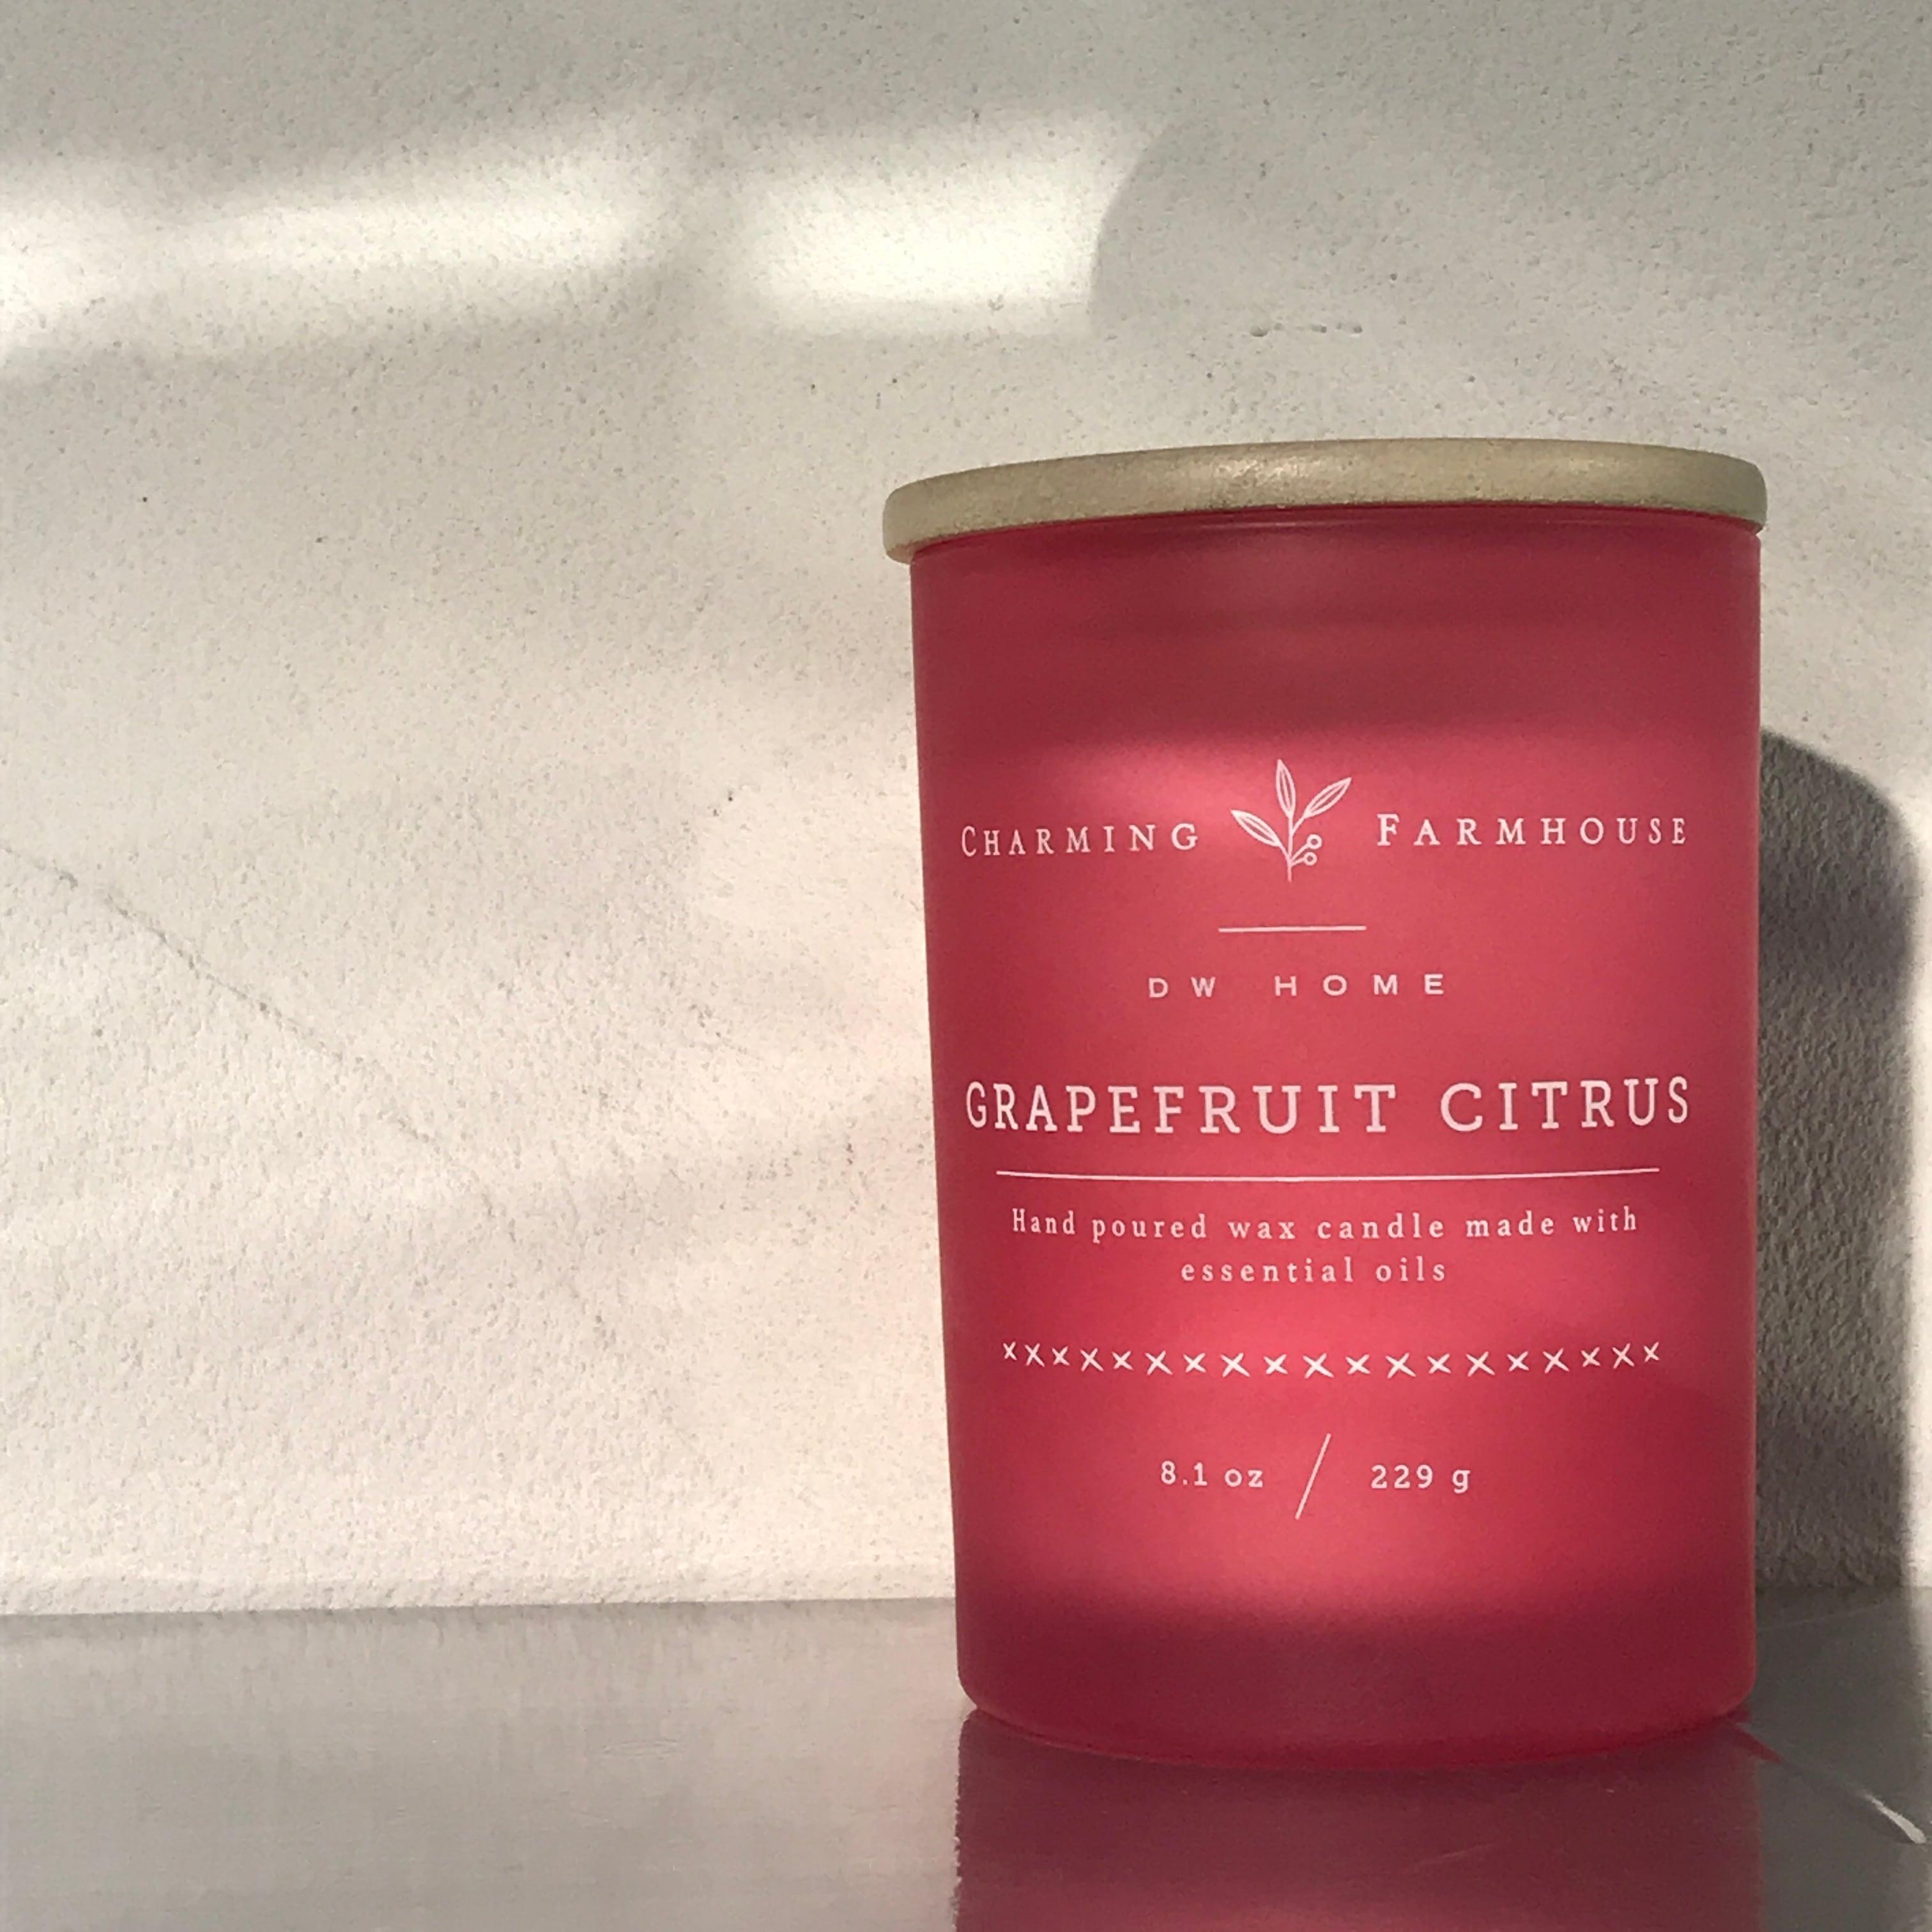 【DW Home Candles】GRAPEFRUIT CITRUS【アロマキャンドル】